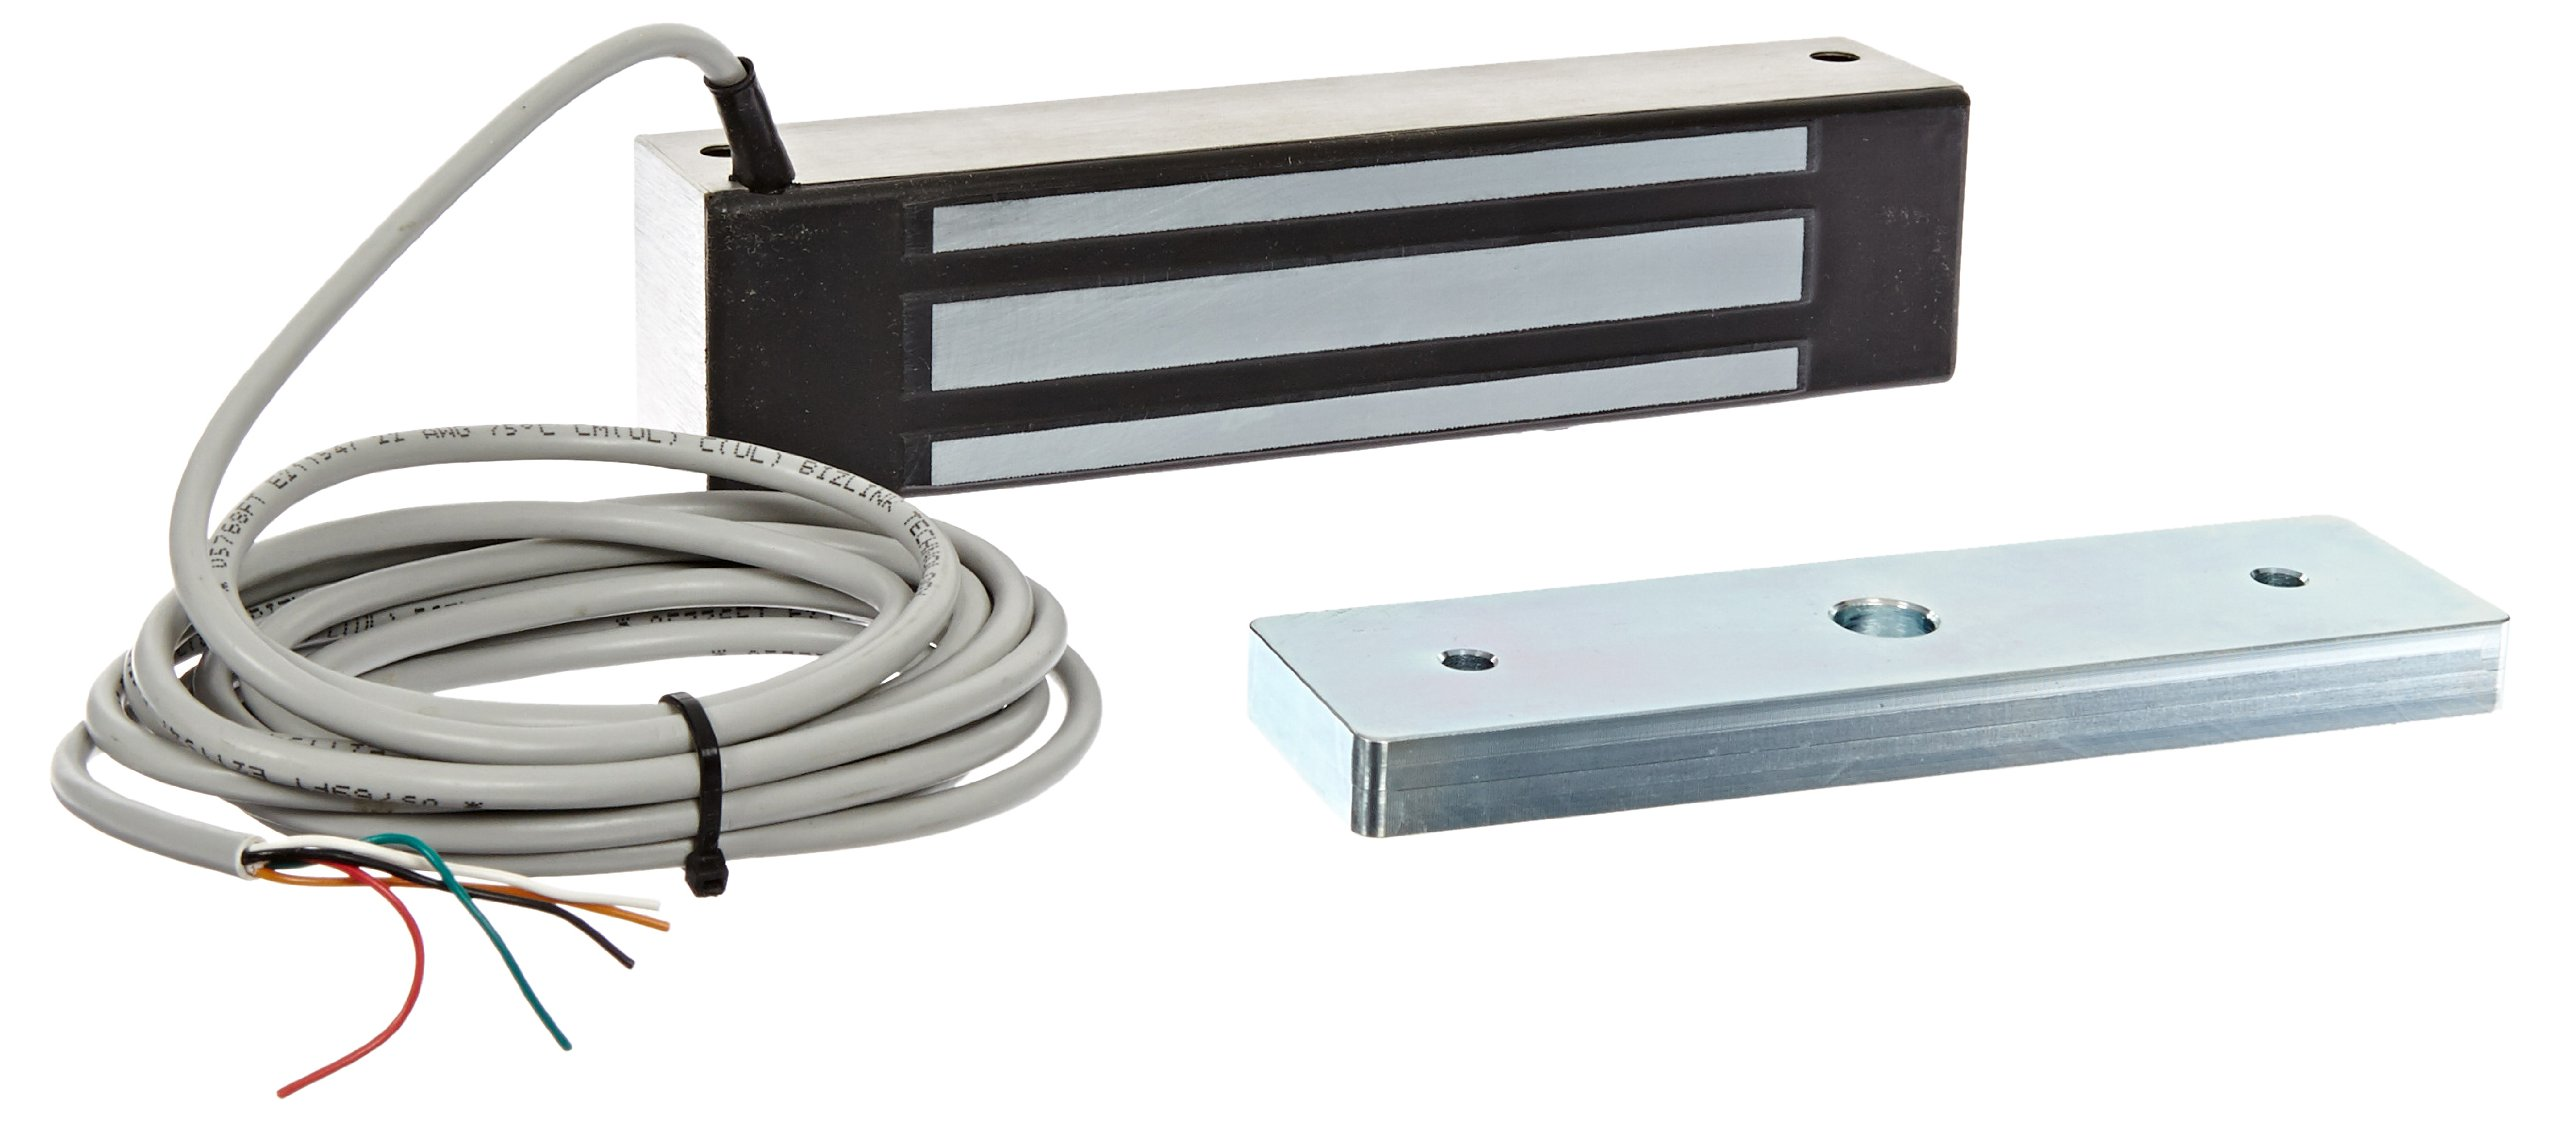 Clear Anodized Finish 12 Length Securitron Aluminum Shim Bracket for M82 Magnalock Electromagnetic Lock